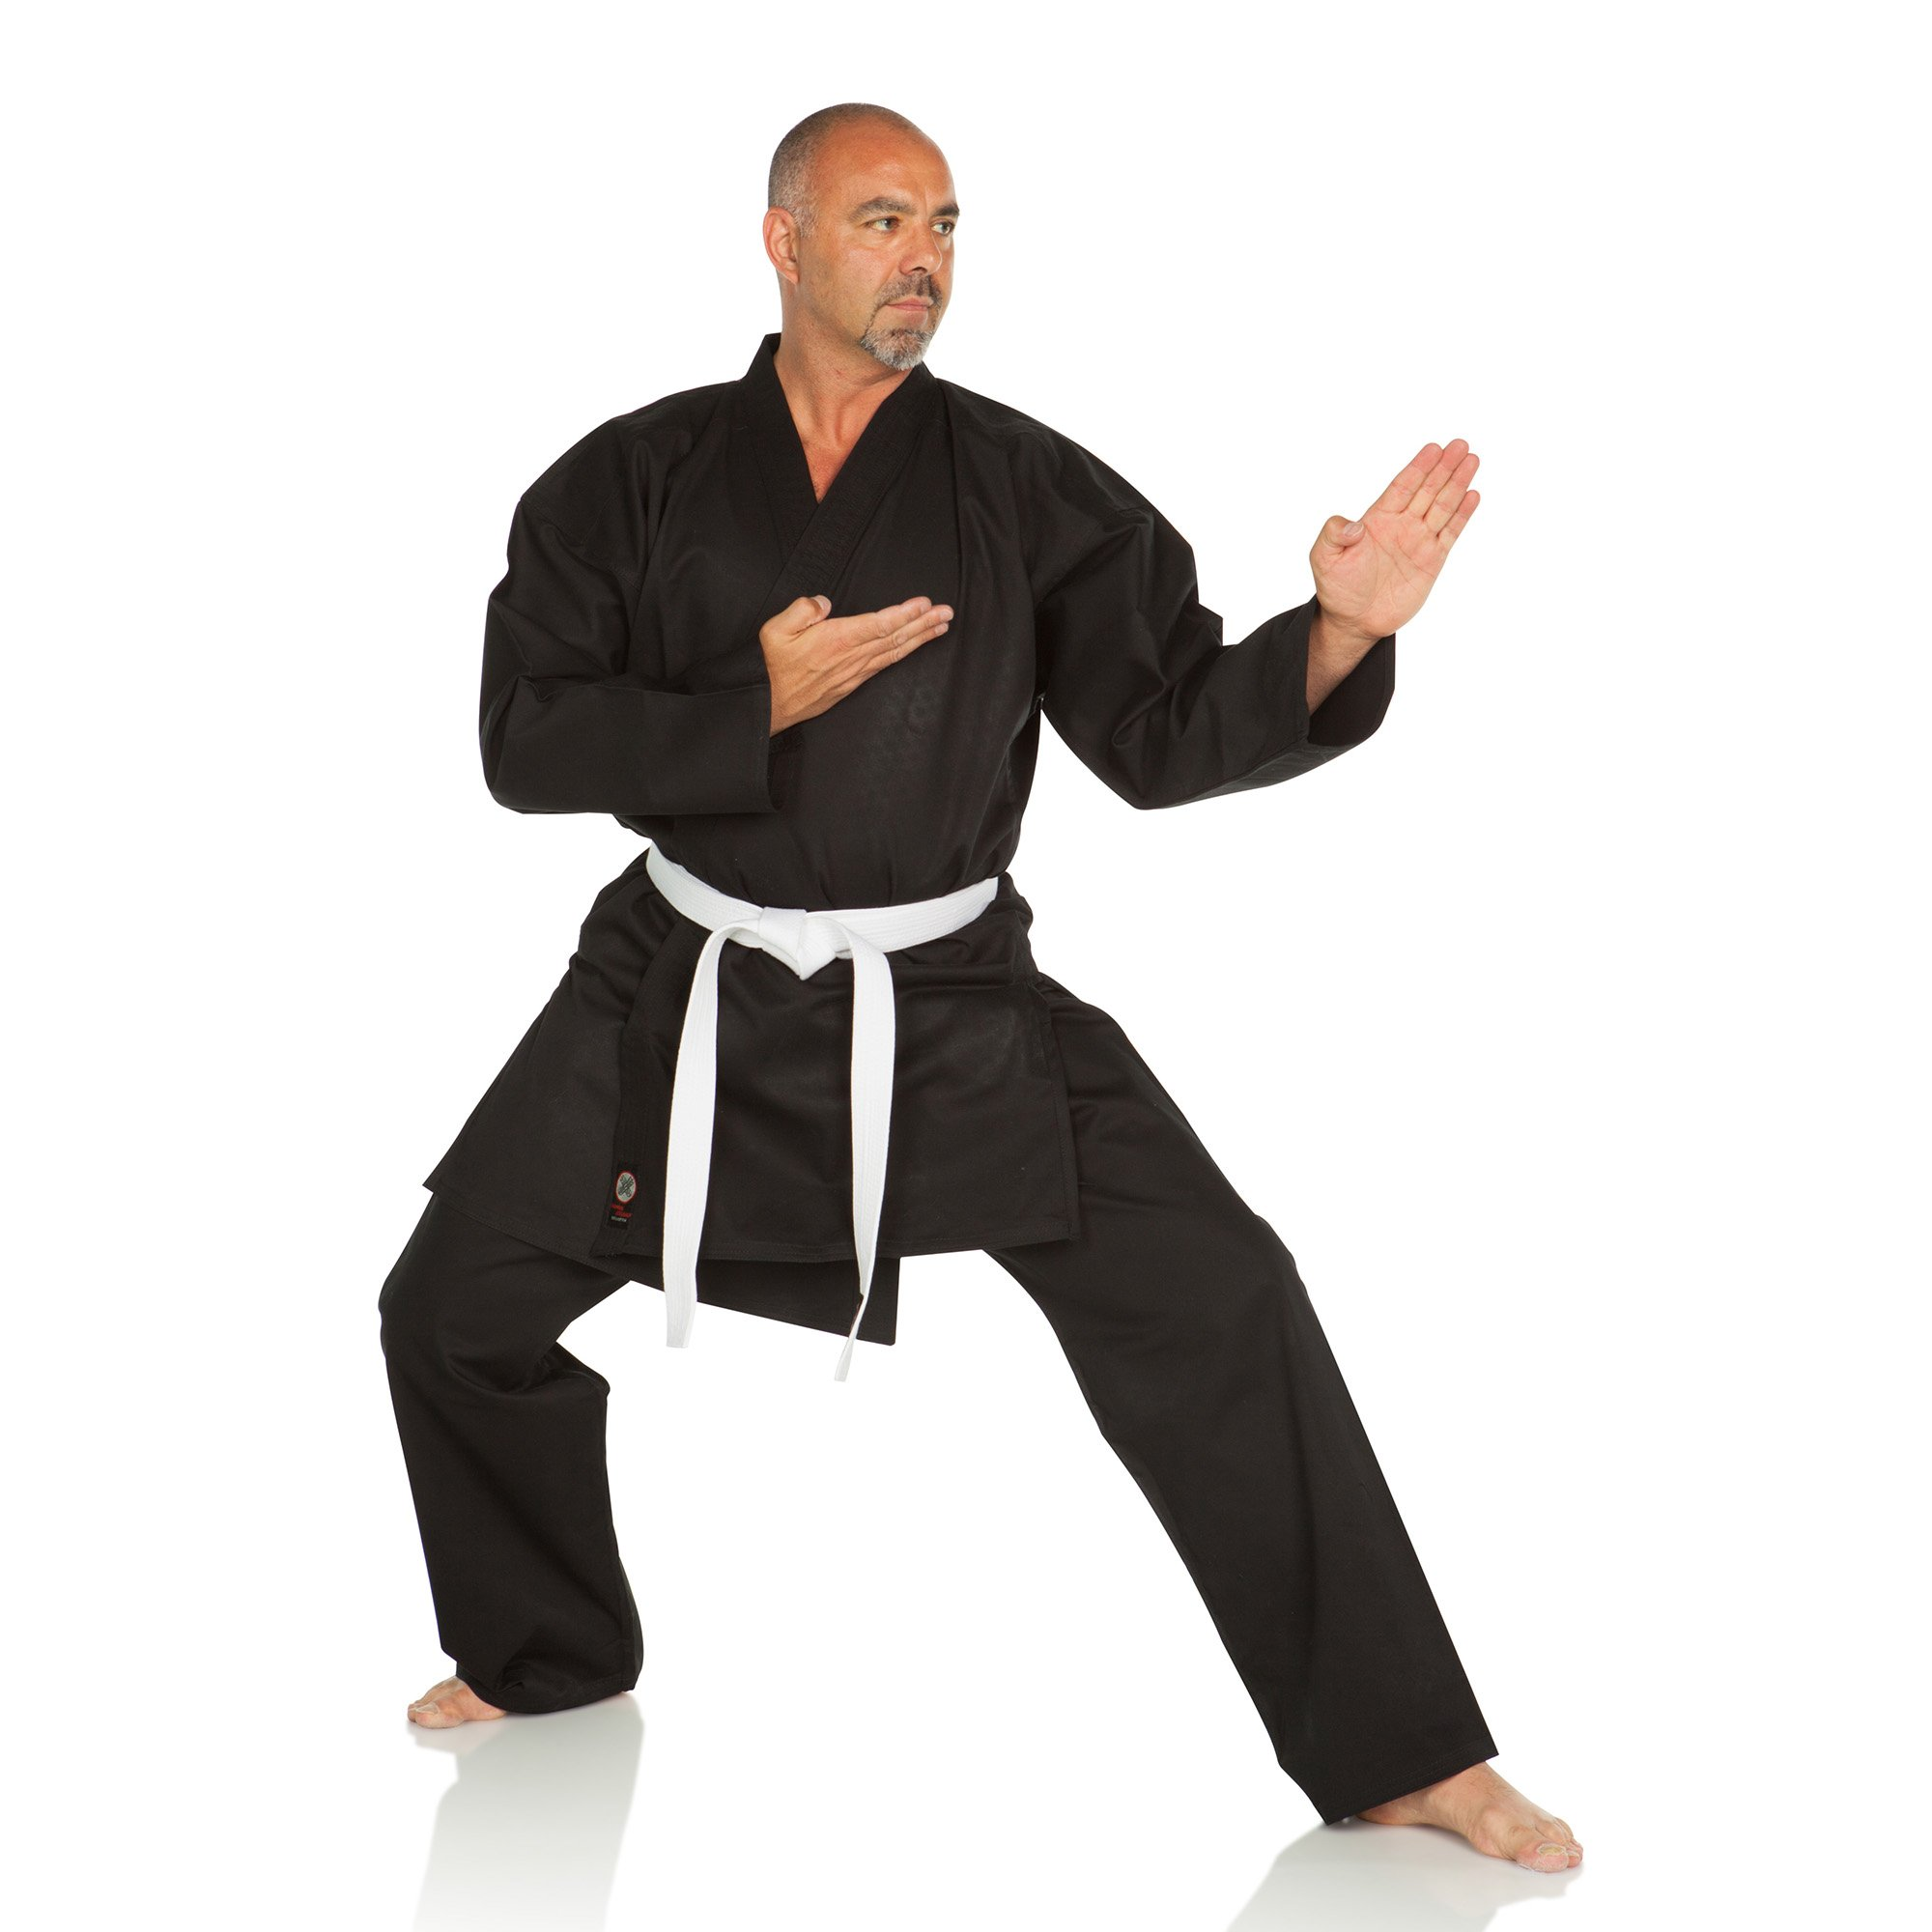 Ronin Karate Gi - Lightweight Student Karate Uniform - Professional Quality Made Kimono - Advanced 100% Cotton Martial Arts Kit Style Karate Training for Adults & Kids. (Black, 1) by Ronin Brand